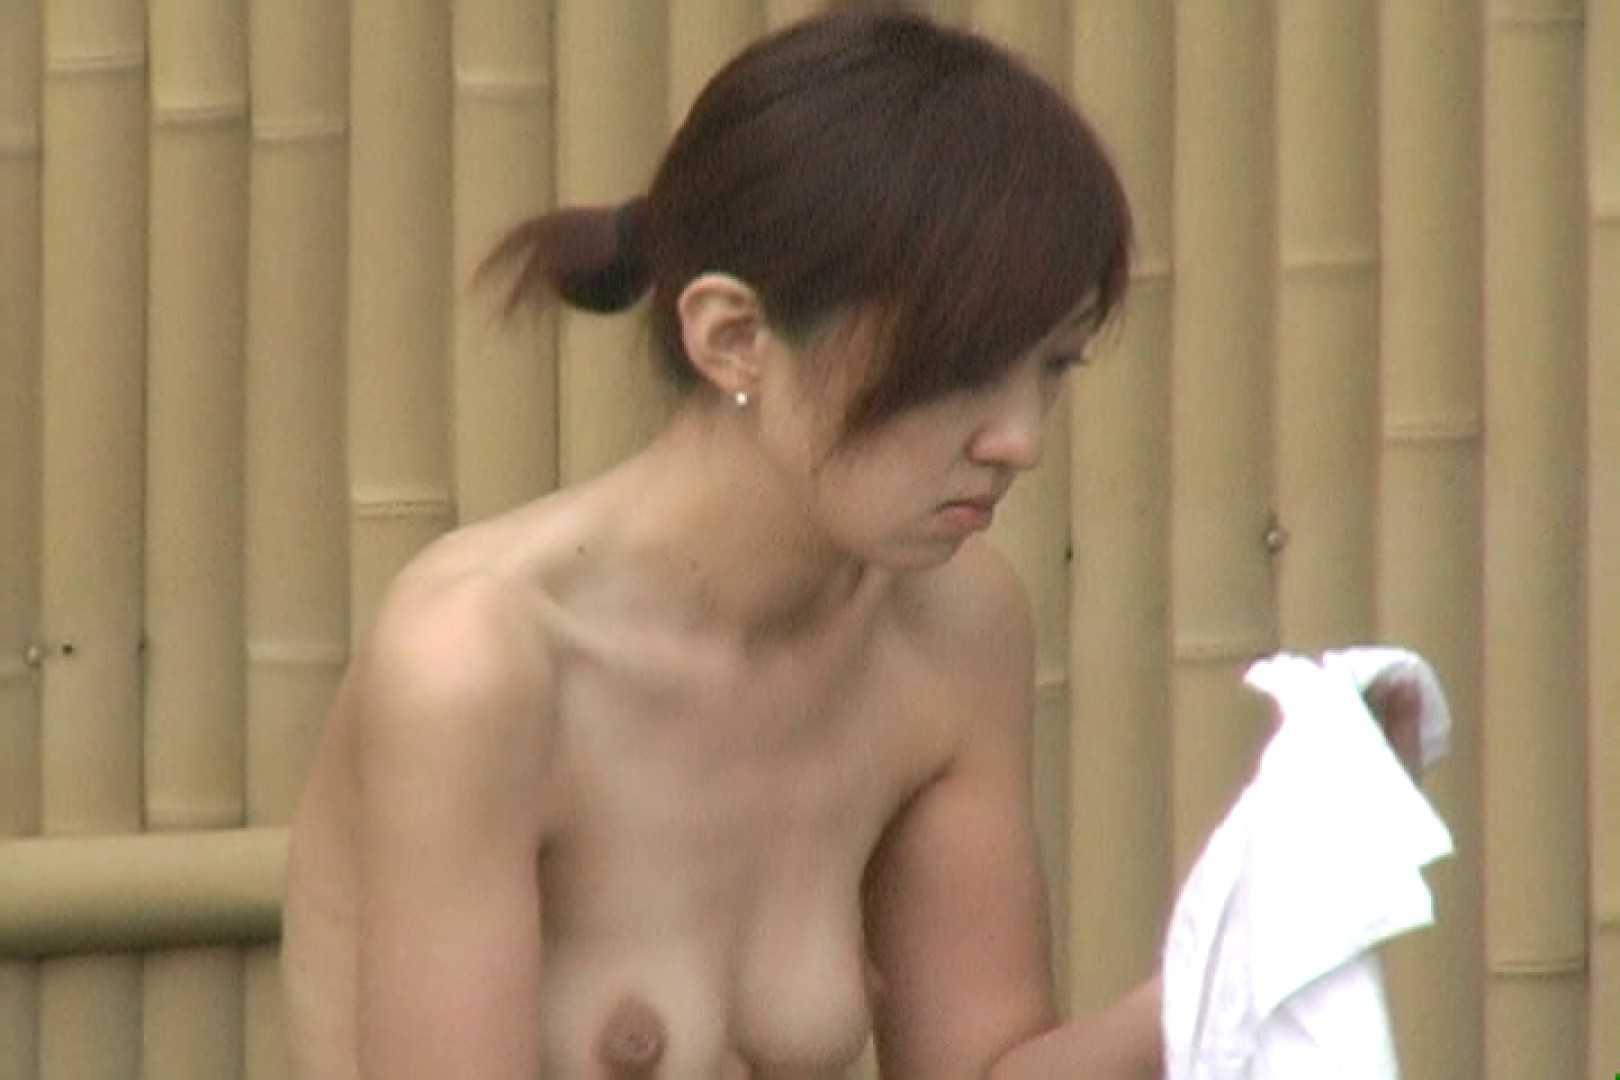 Aquaな露天風呂Vol.629 いやらしいOL オマンコ無修正動画無料 23連発 22